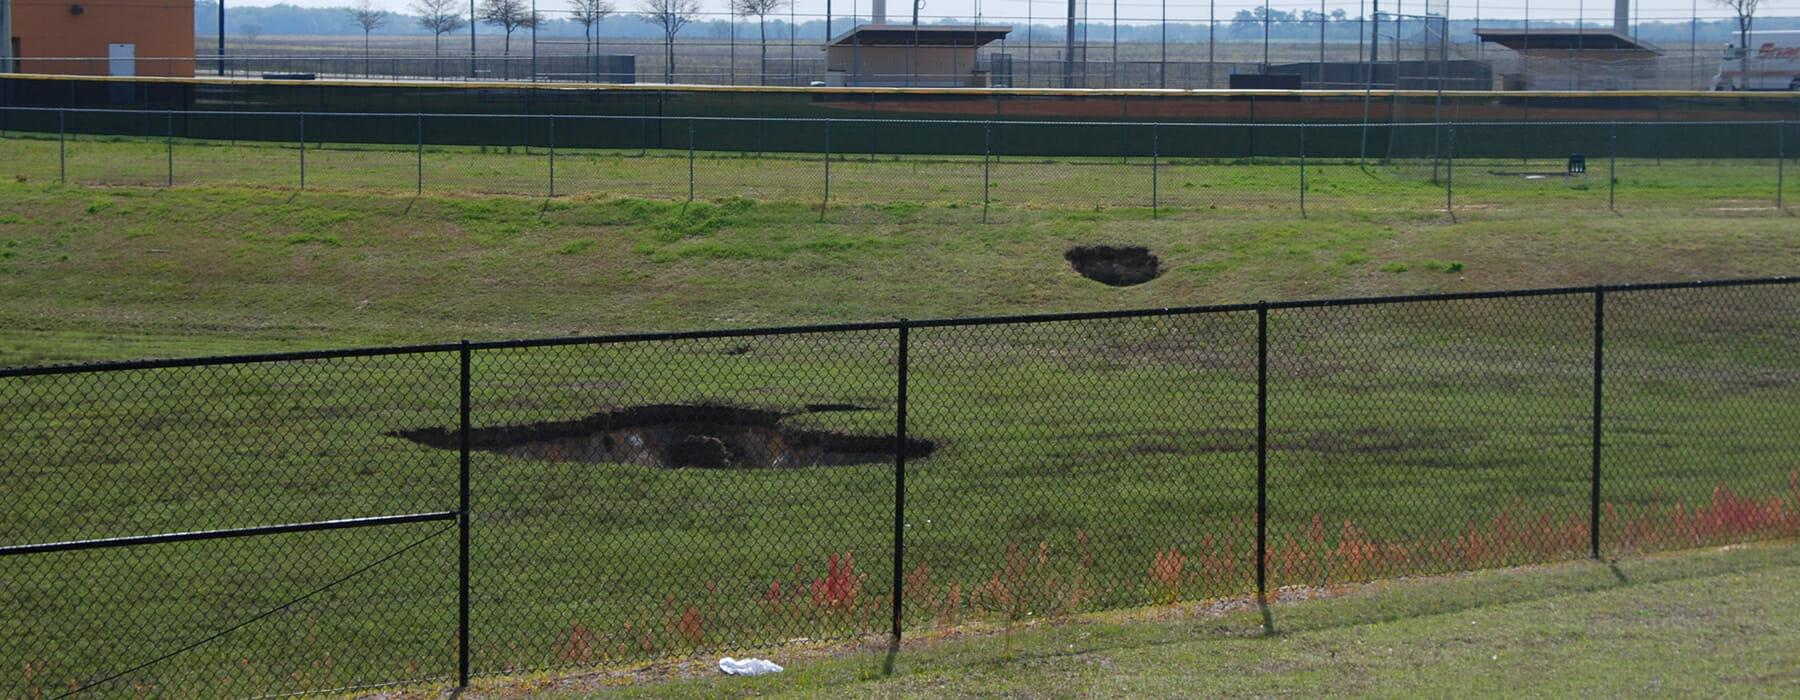 Sinkhole at West Port High School Ocala